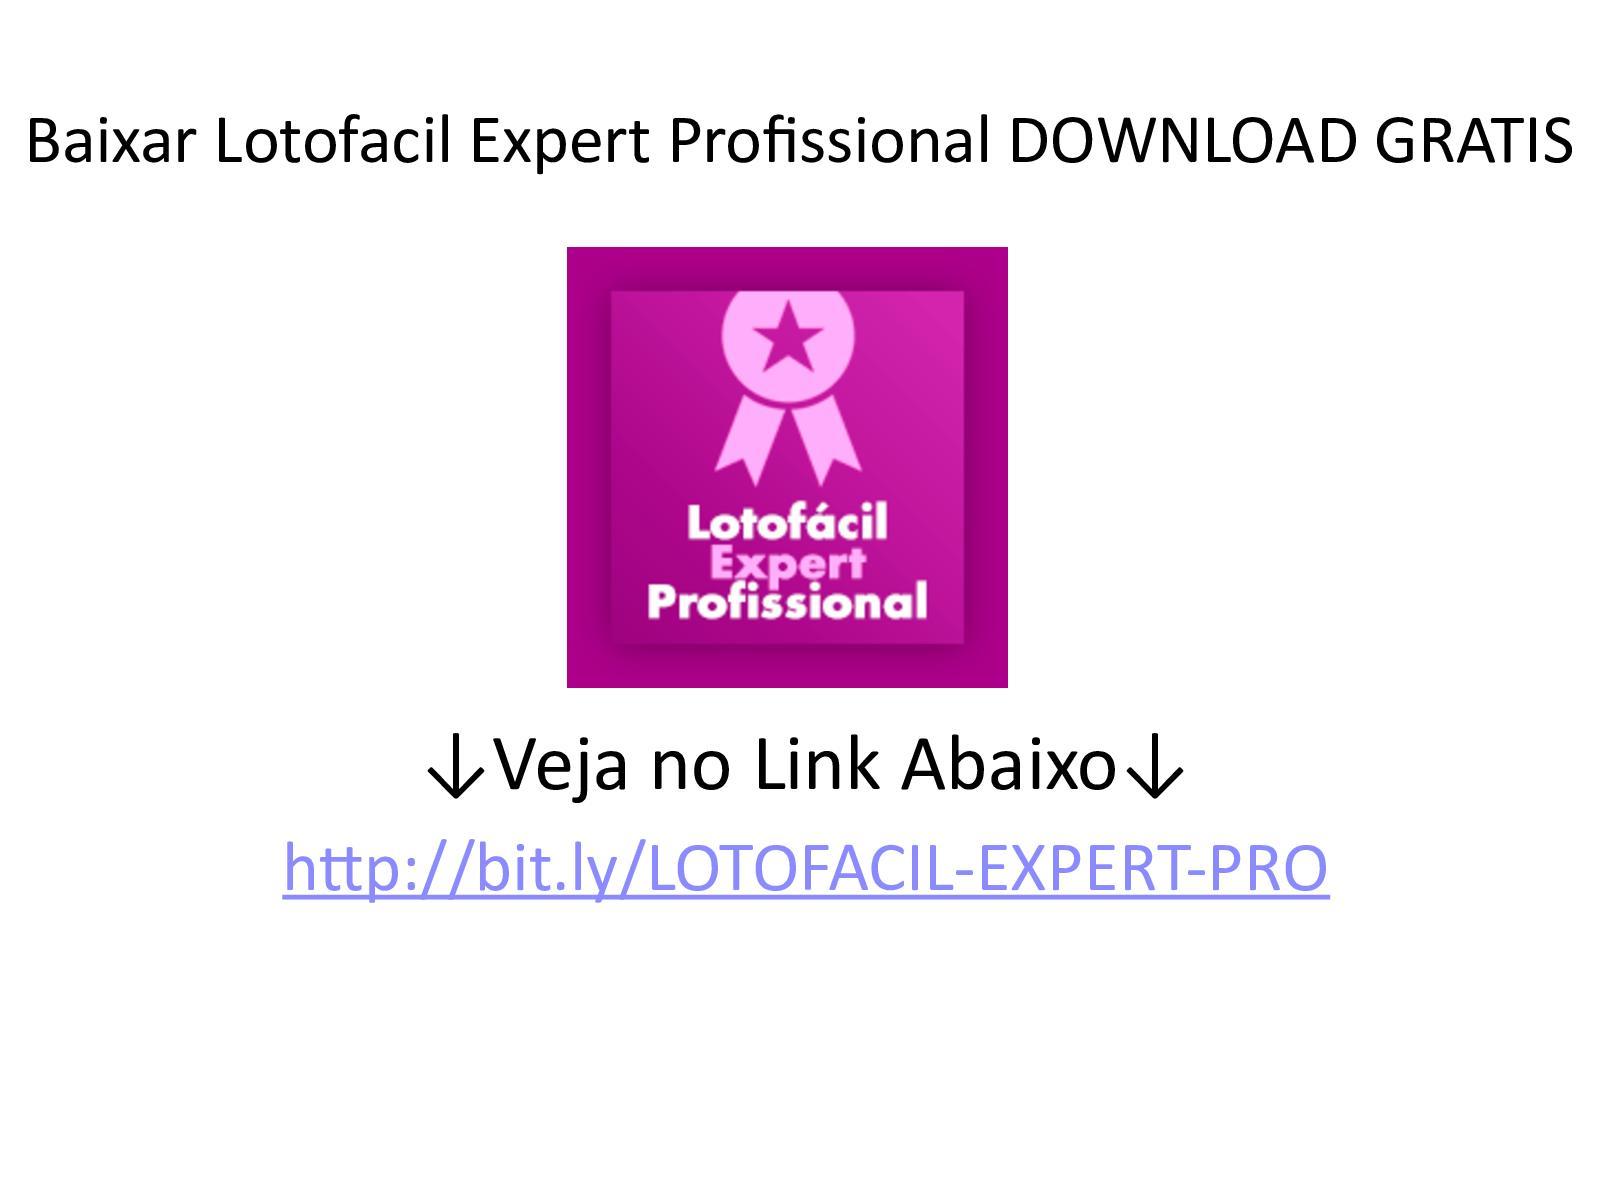 robô lotofacil download gratis